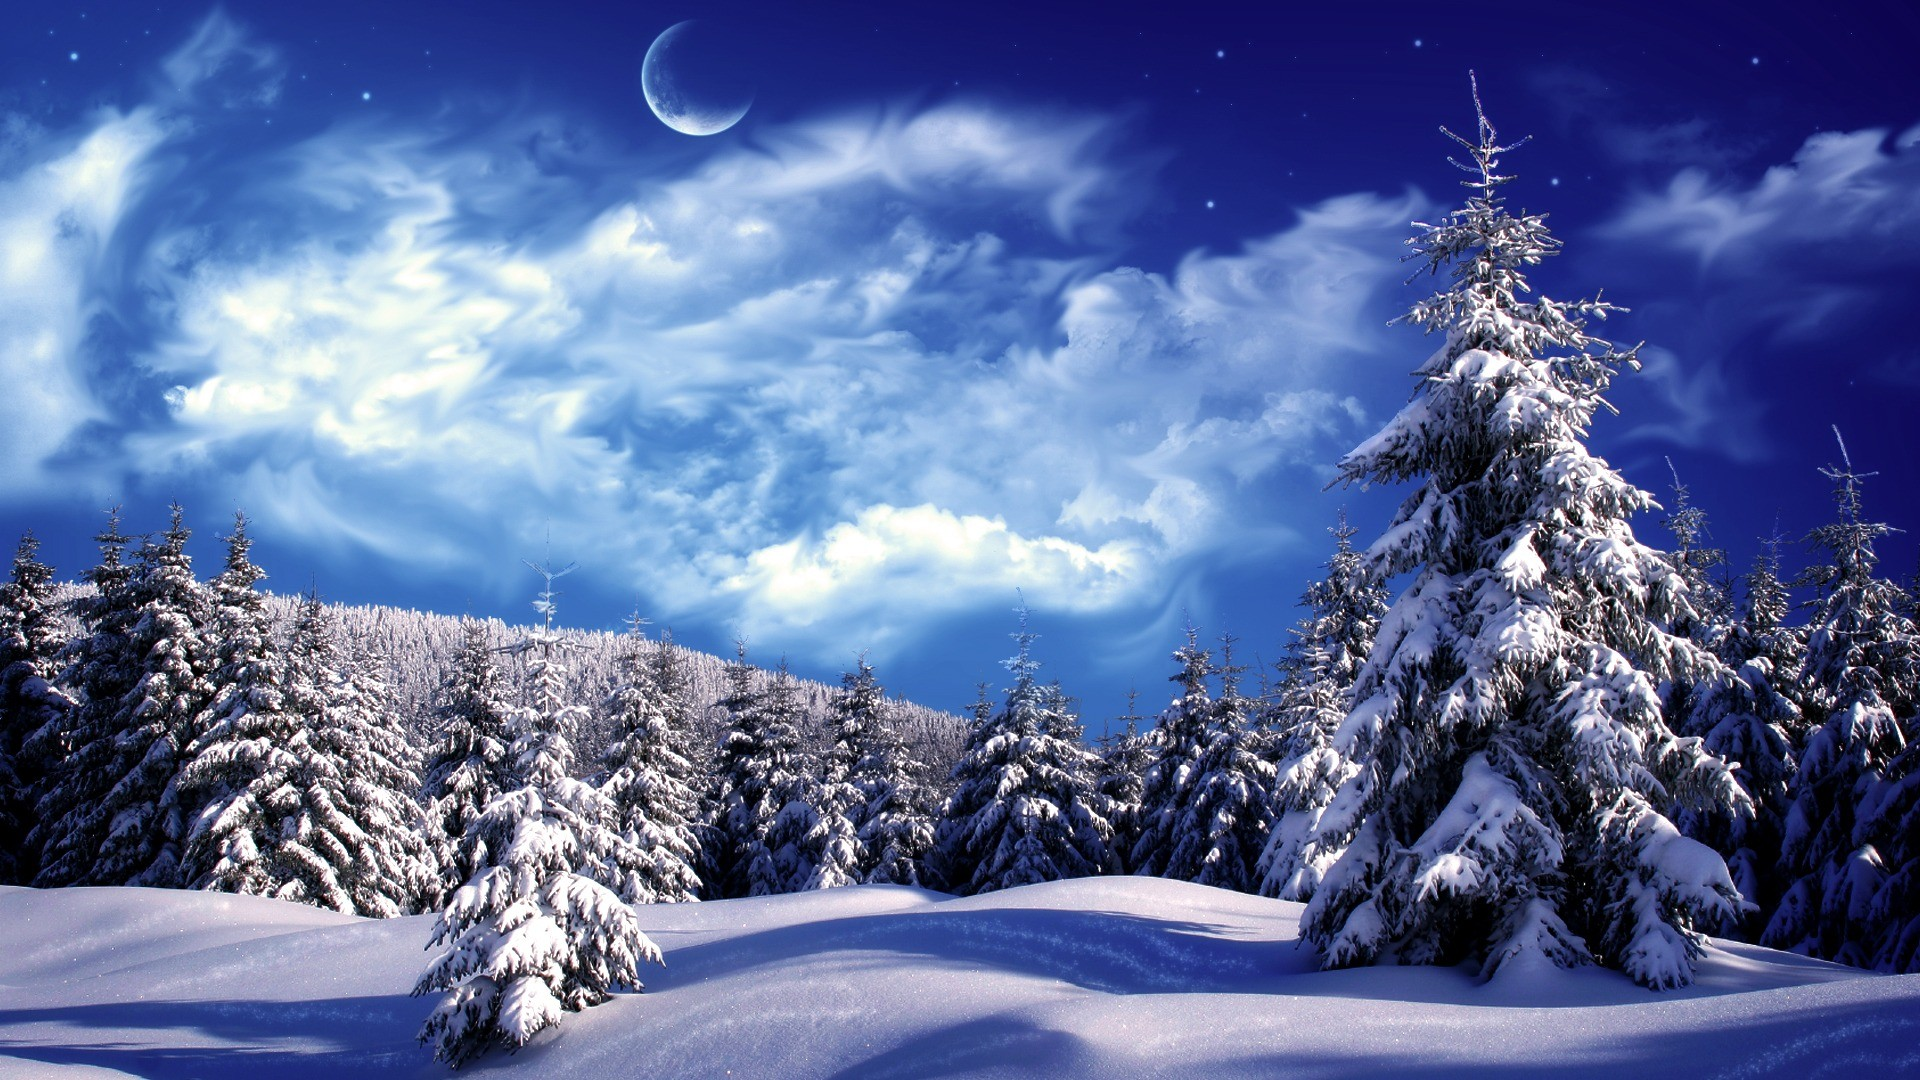 Winter Wallpaper 1920x1080 63 Images